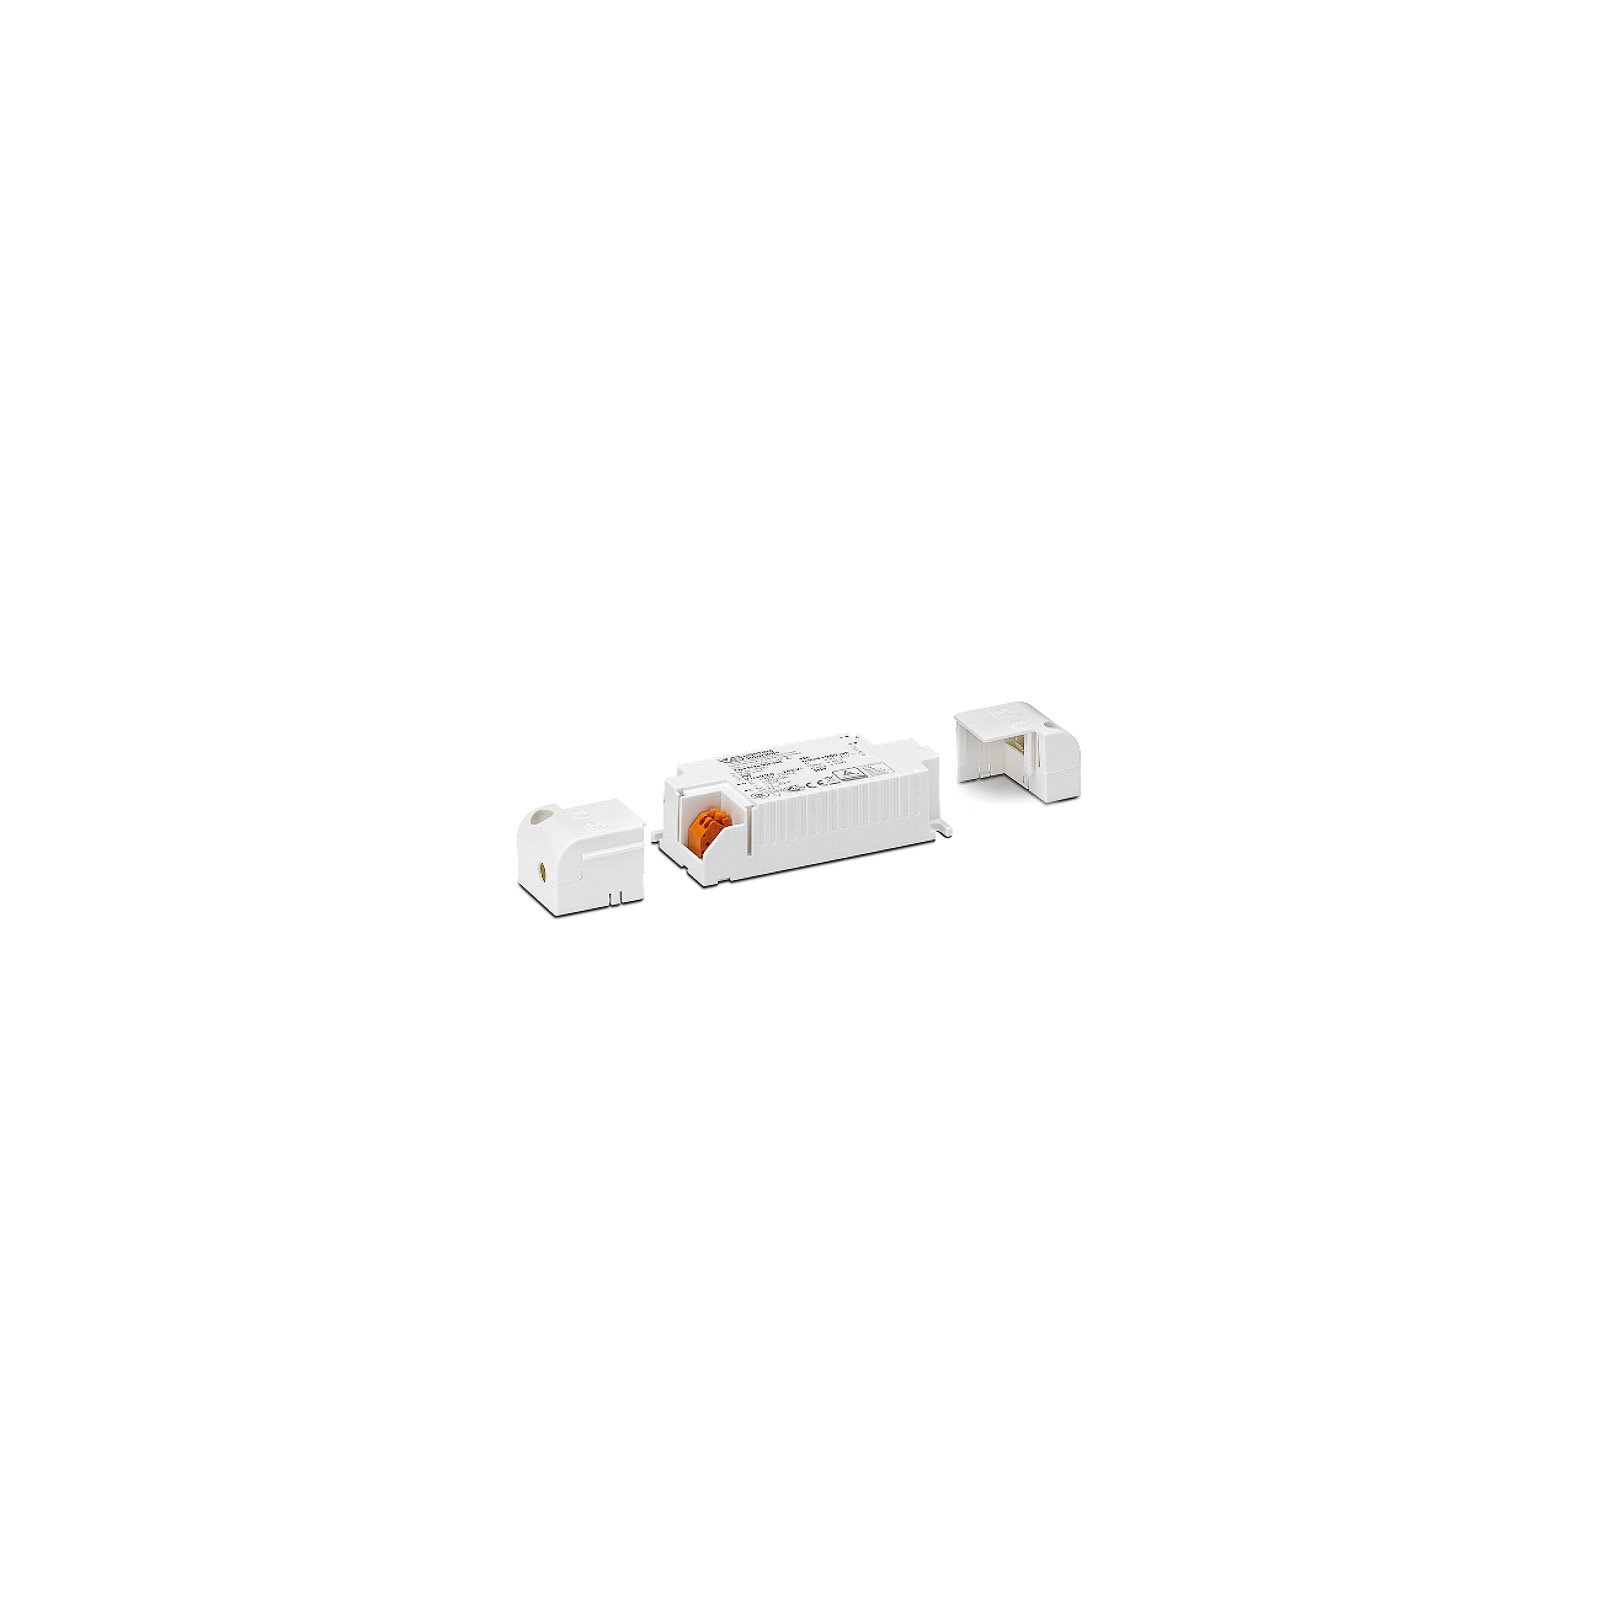 LED-Treiber max. 28 W, 30-40 V DC, 700 mA